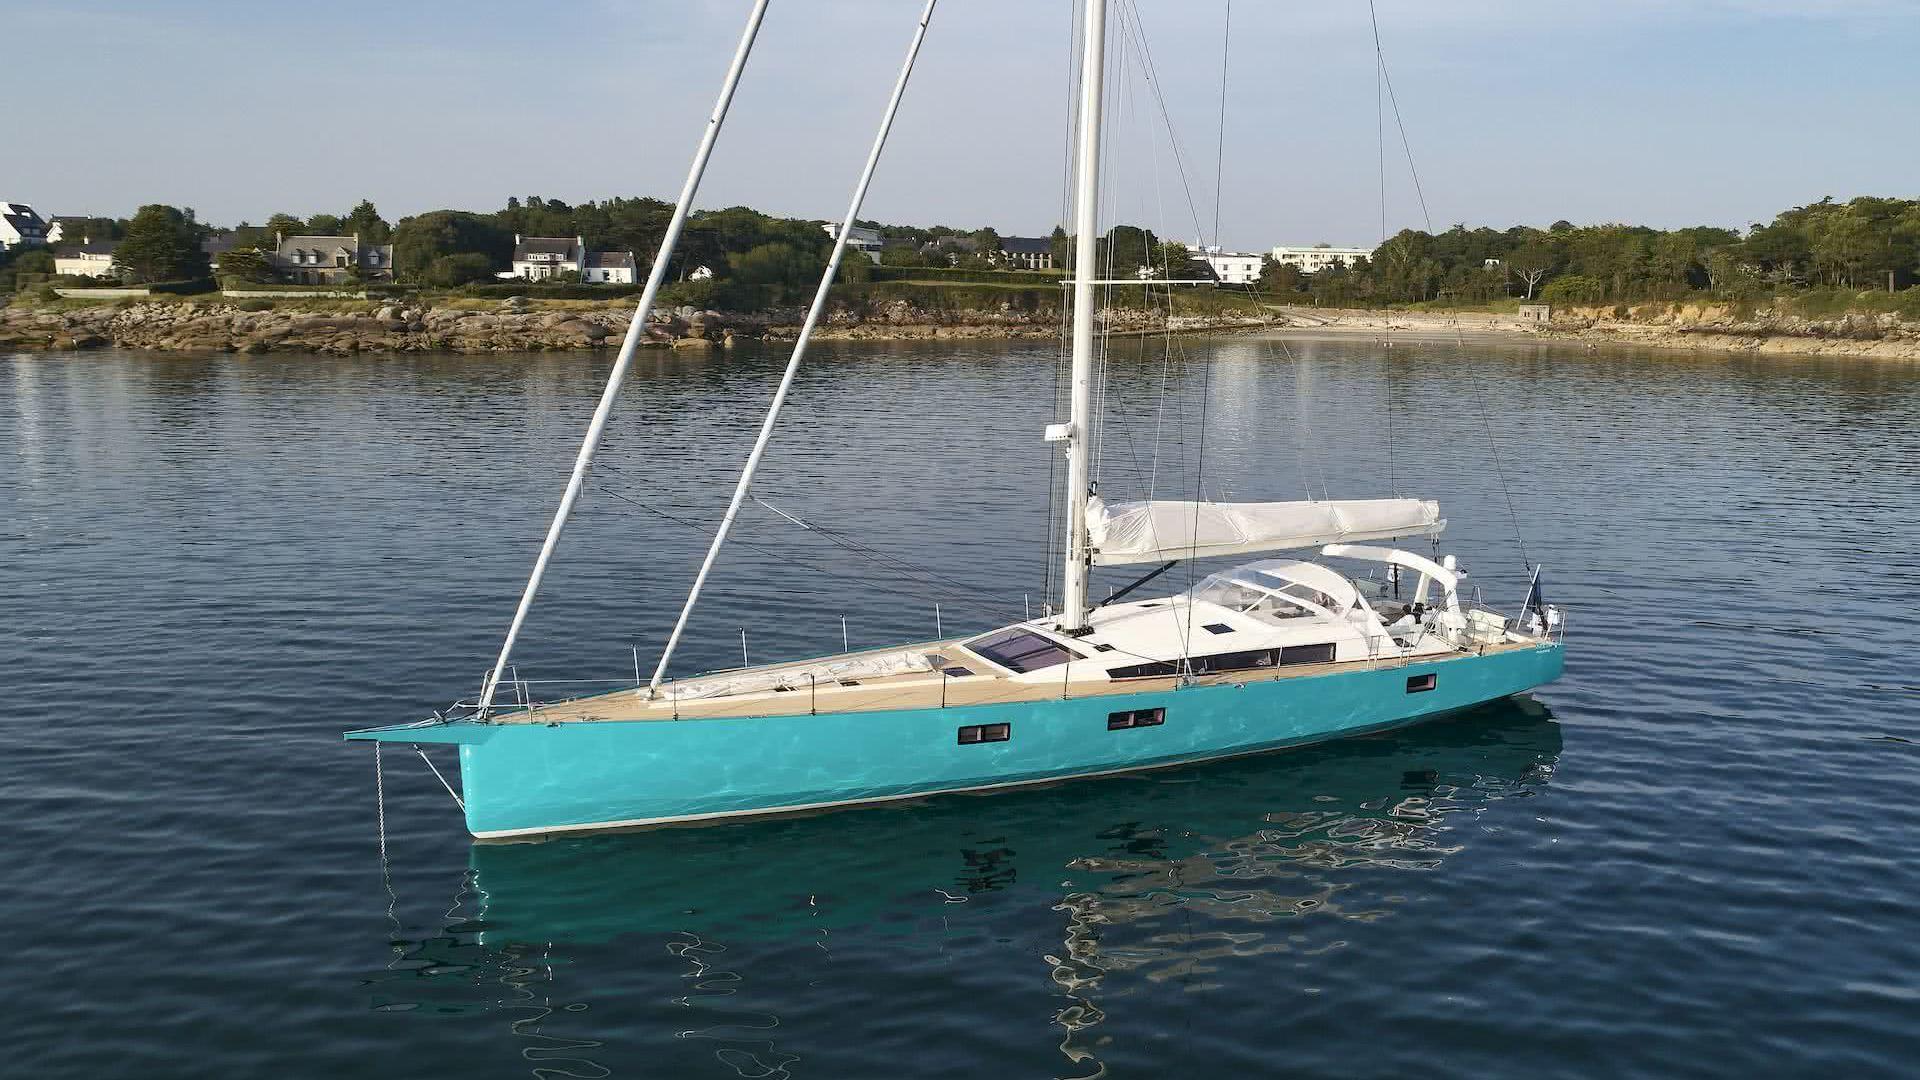 BASYC Yacht Finot-Conq